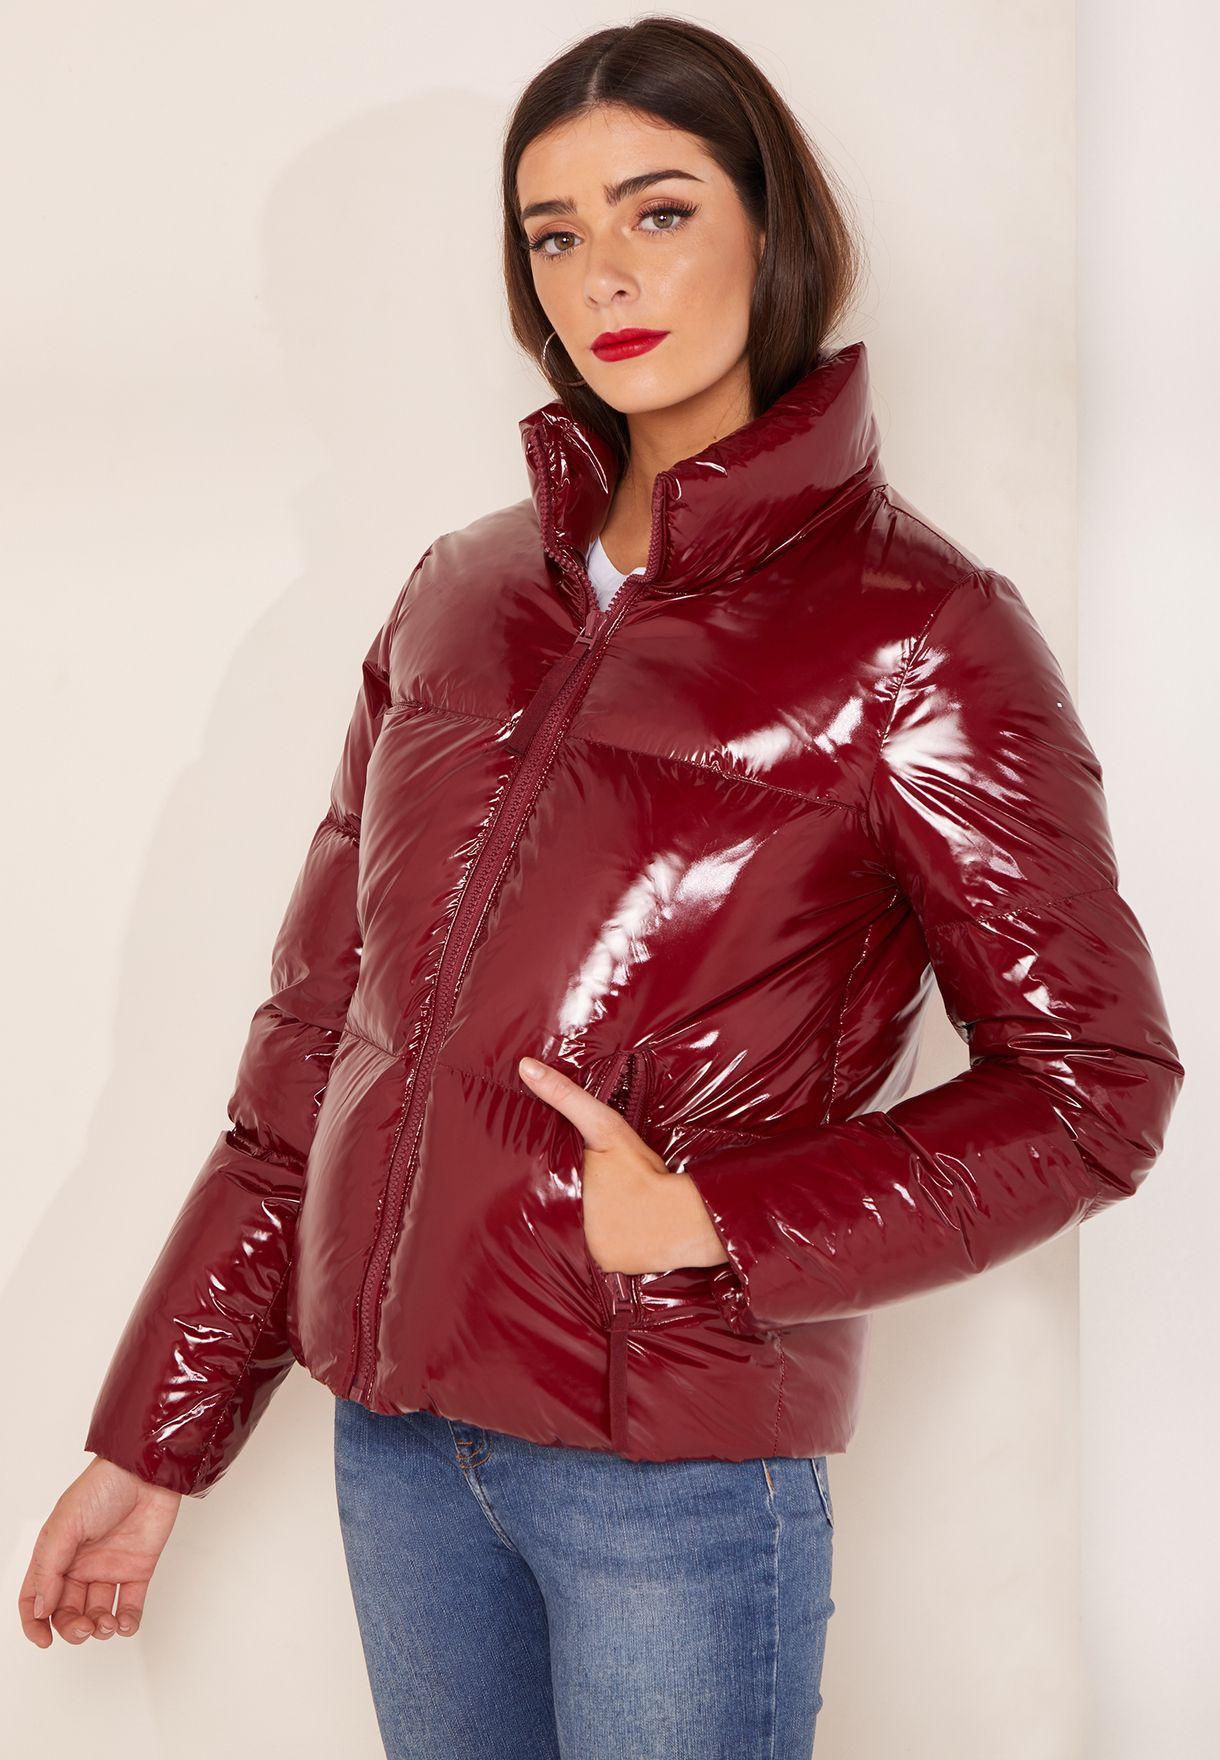 950089f0 Shop Tommy Hilfiger red High Gloss Down Jacket WW0WW23512 for Women ...